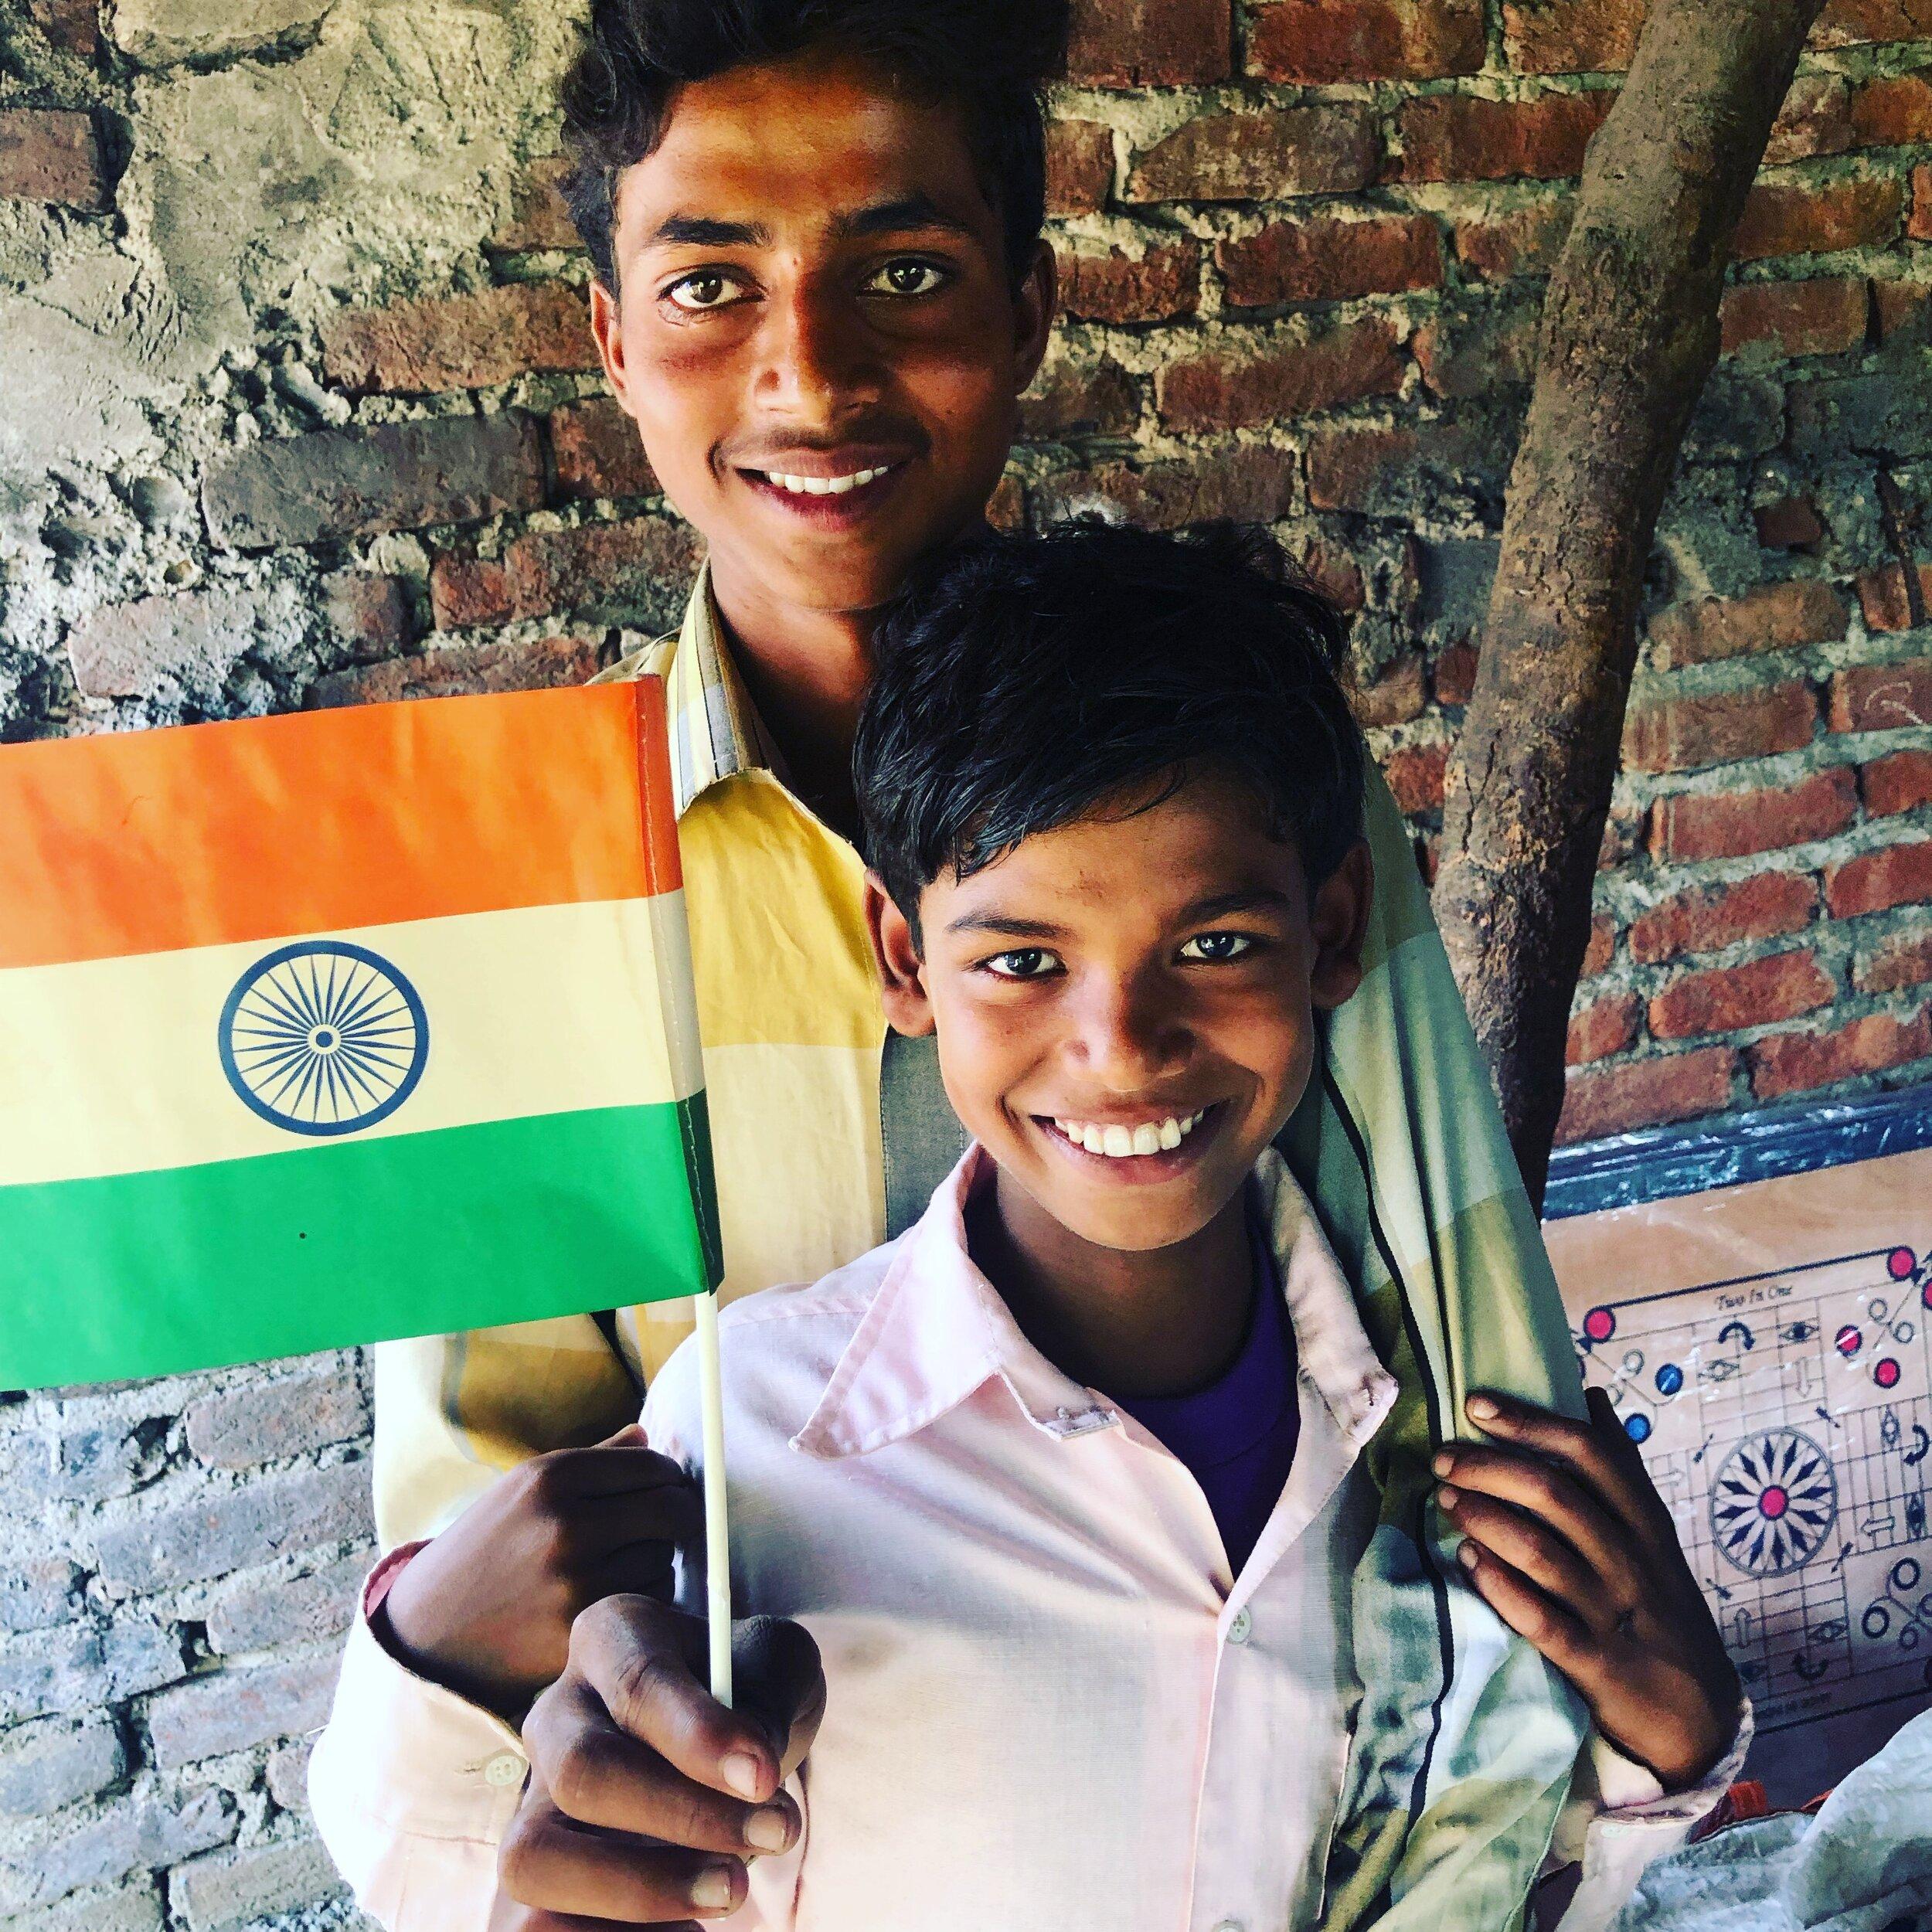 Kids at the 'Project Help' Education Centre at Jungle Village Bagwala.